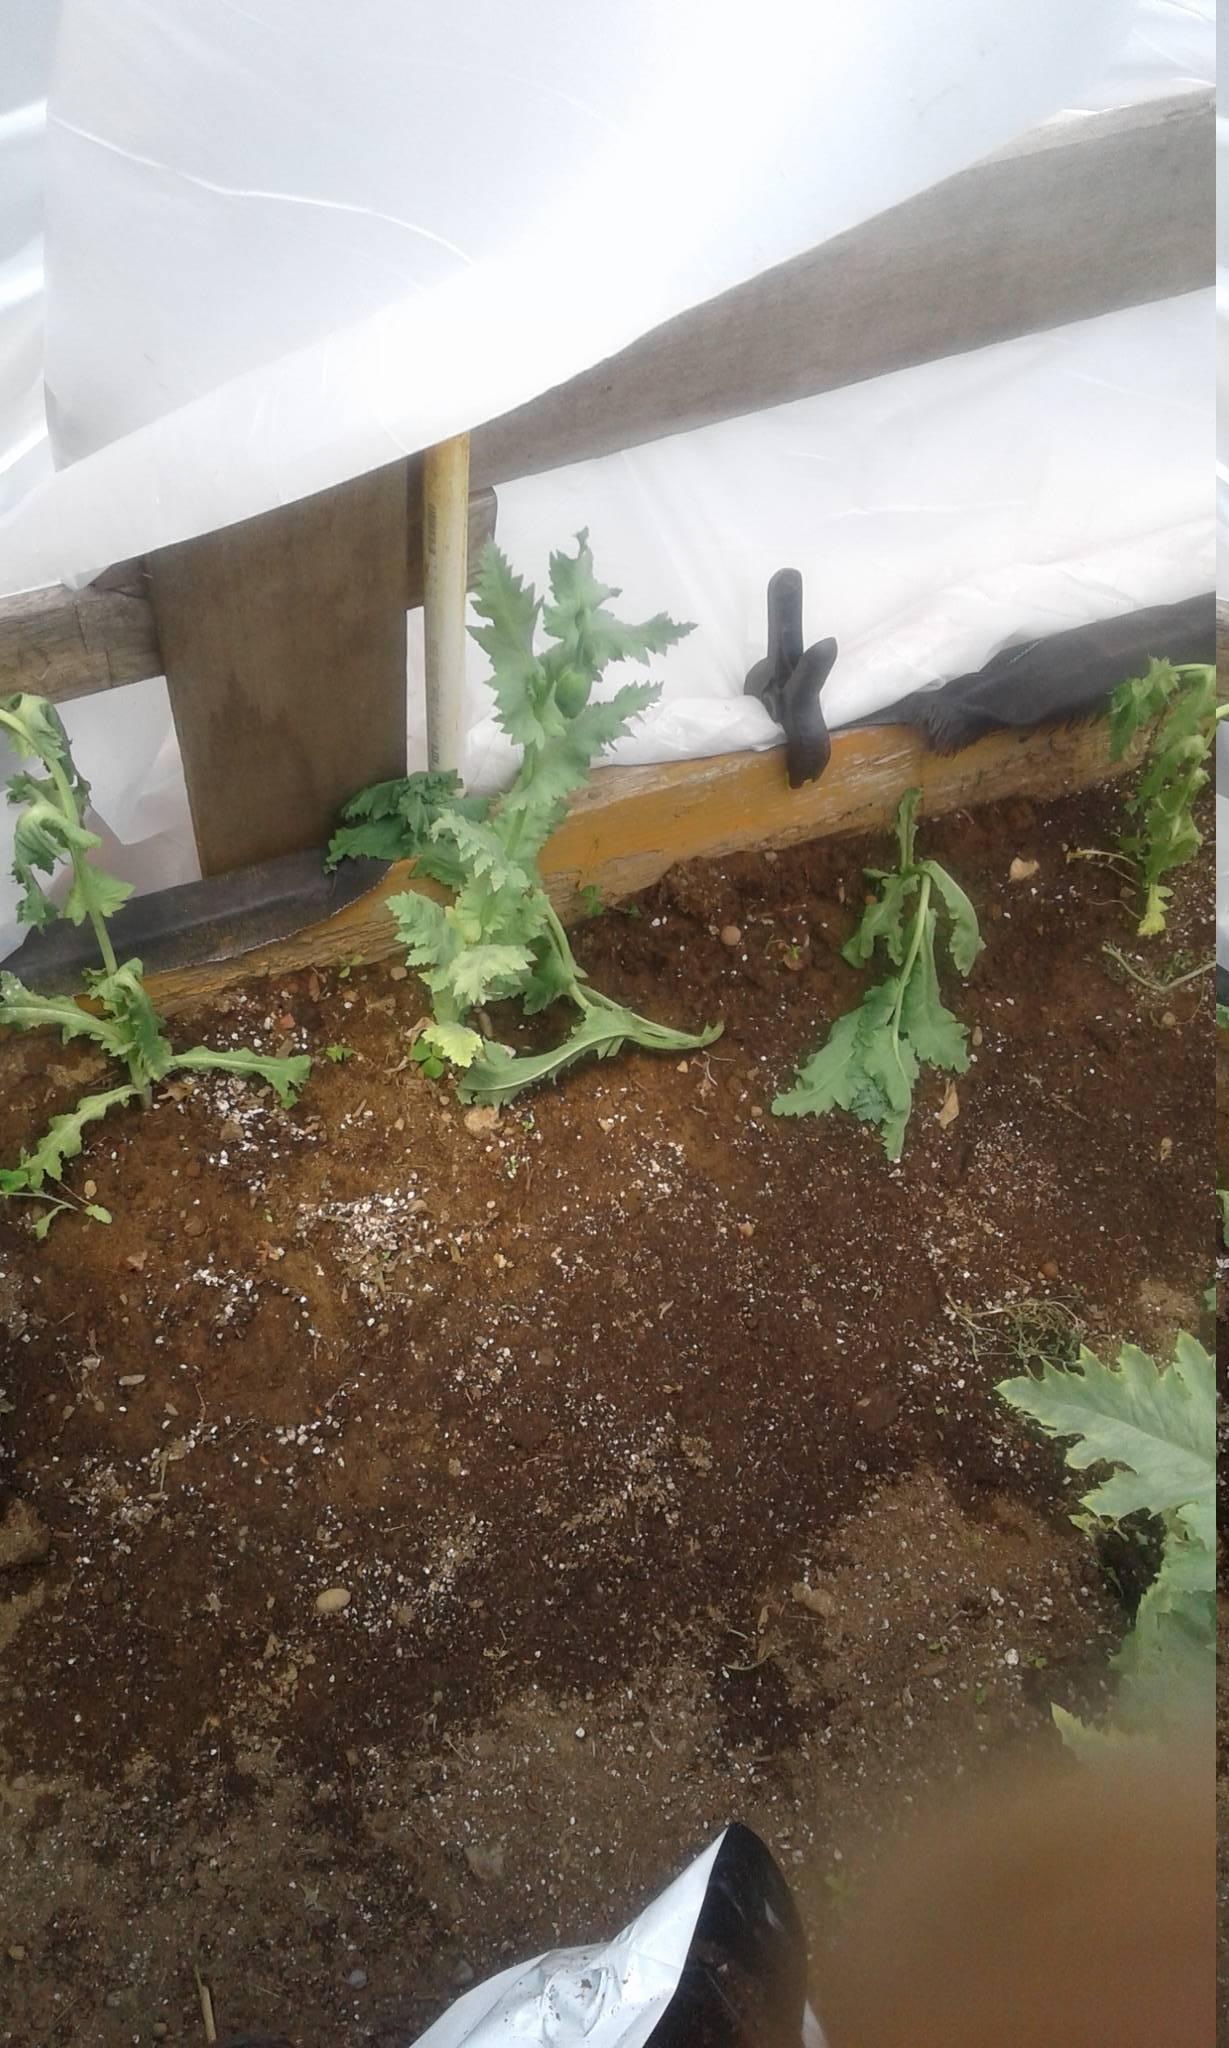 Transplanting poppies NEVER works. - The Ethnobotanical Garden ...